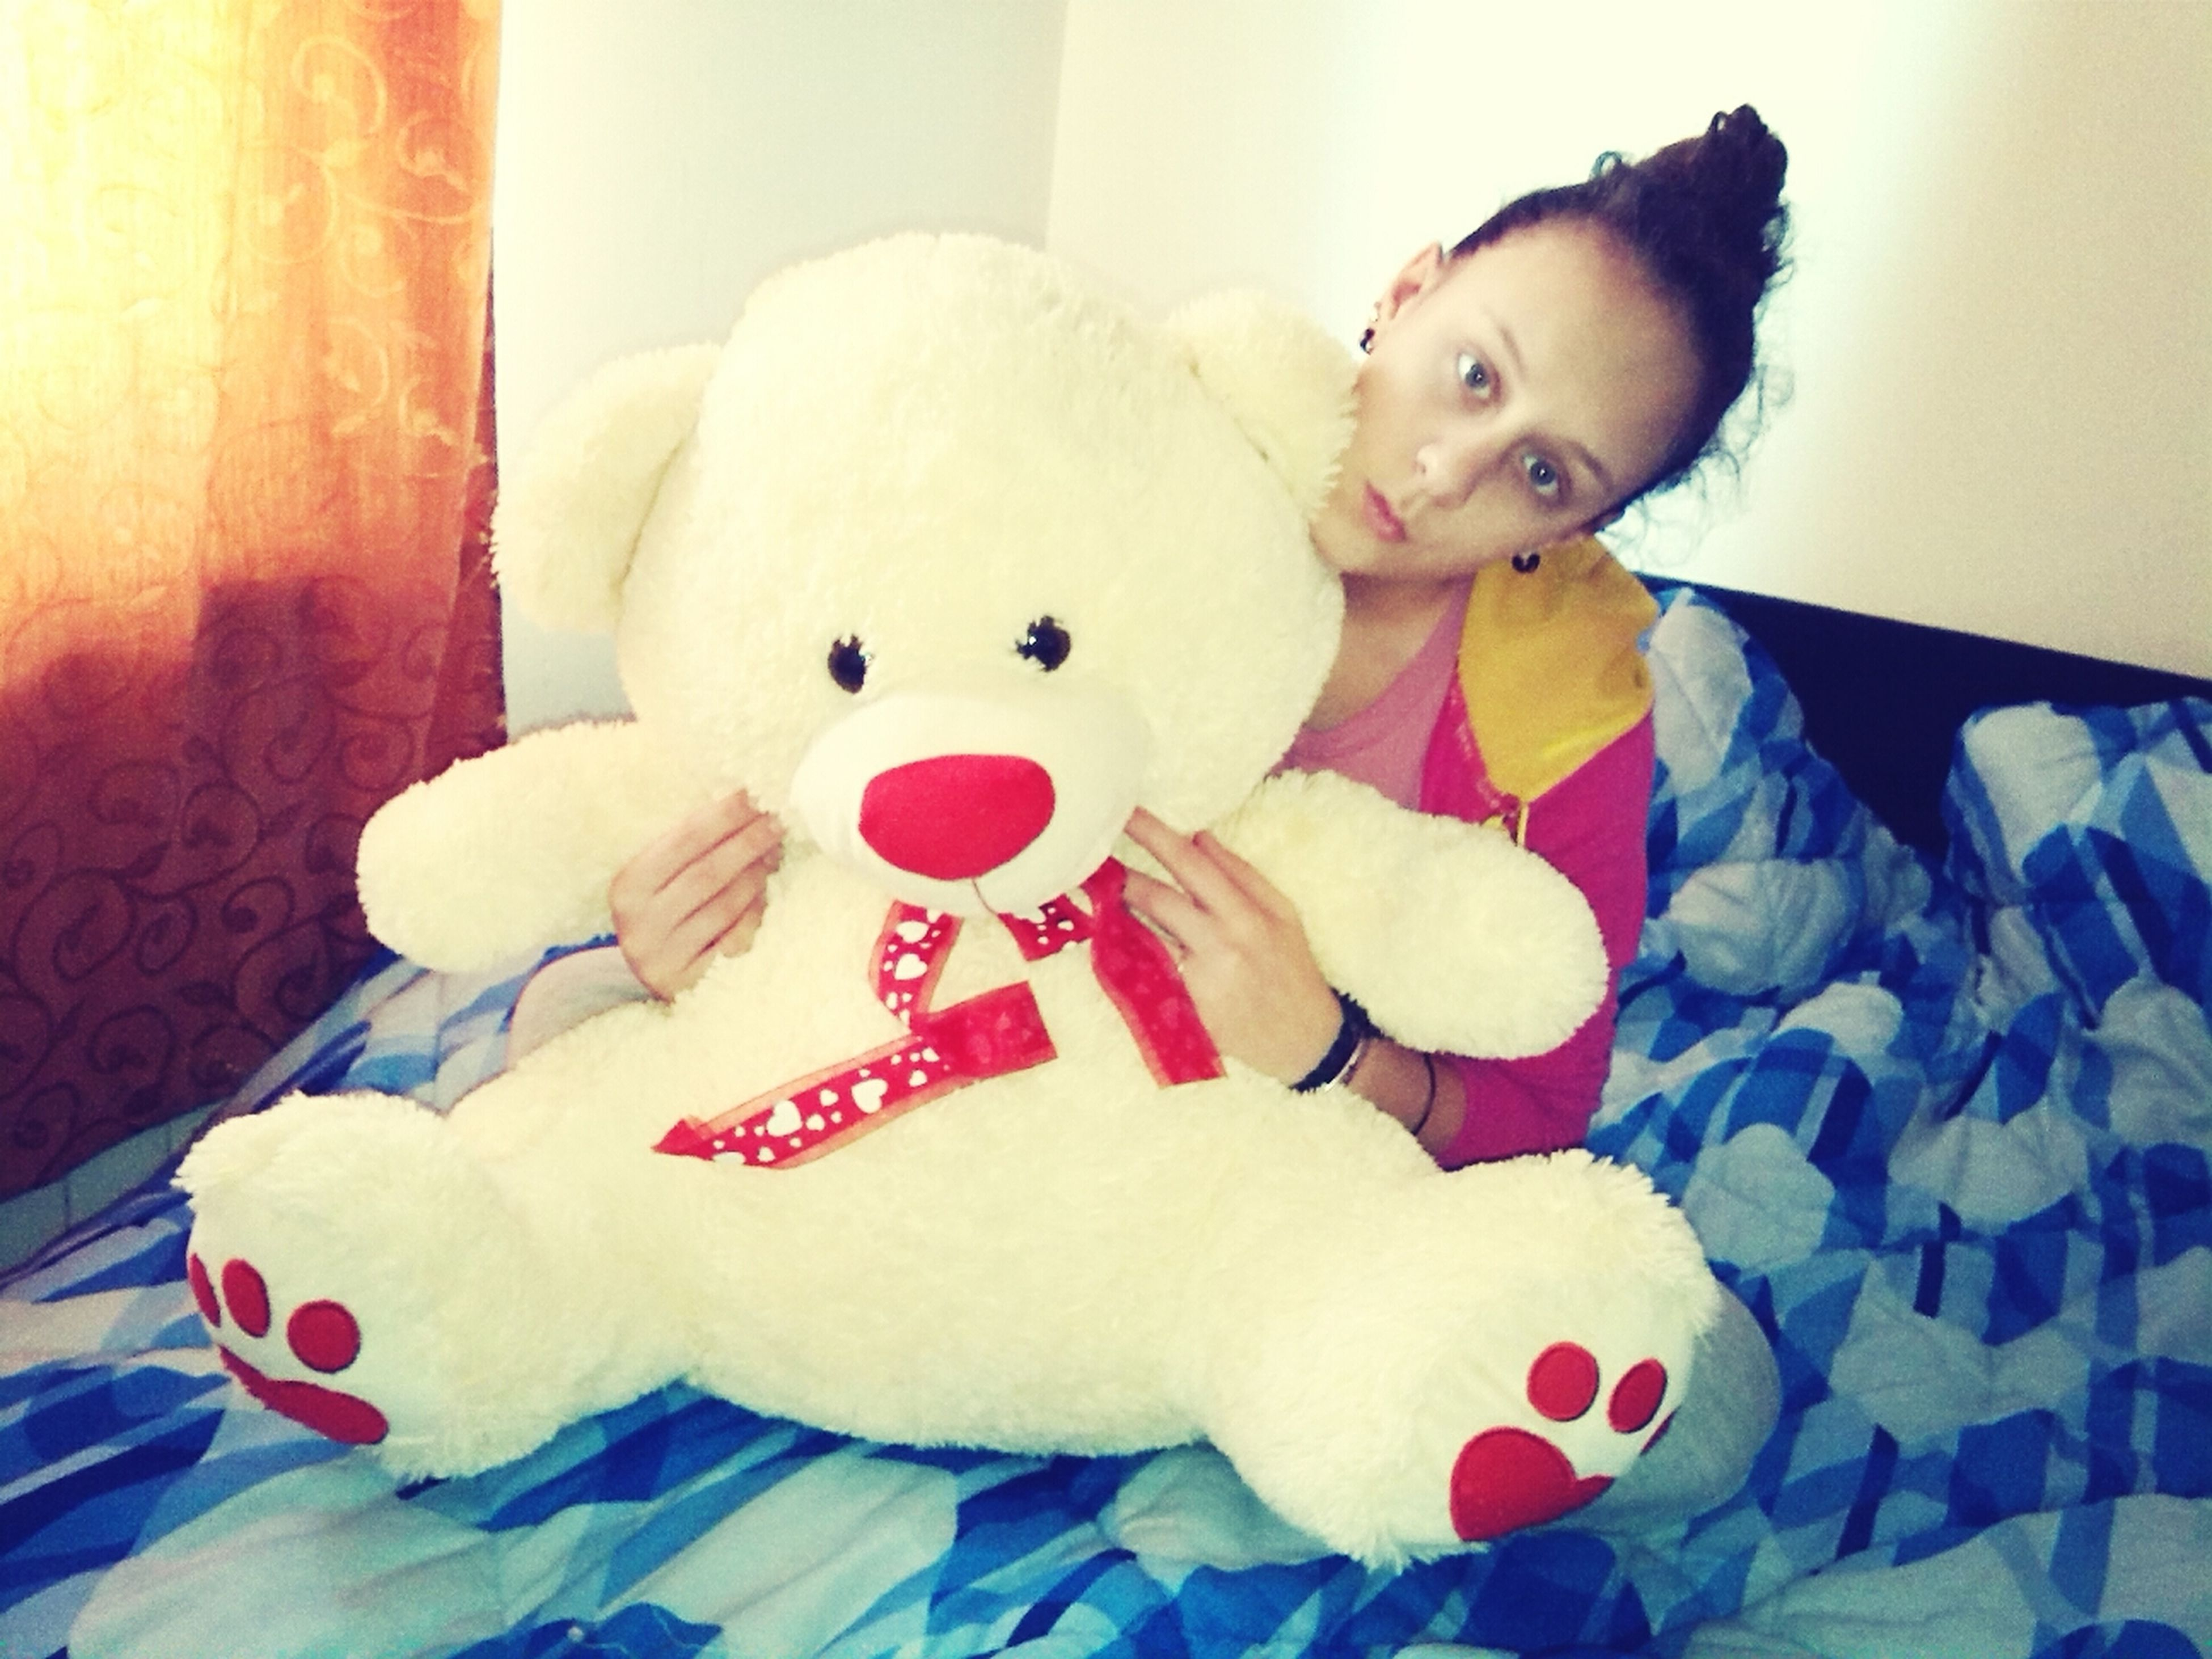 Big Teddy Bear  I'm Loving It. :3 Today Taken Photo <33